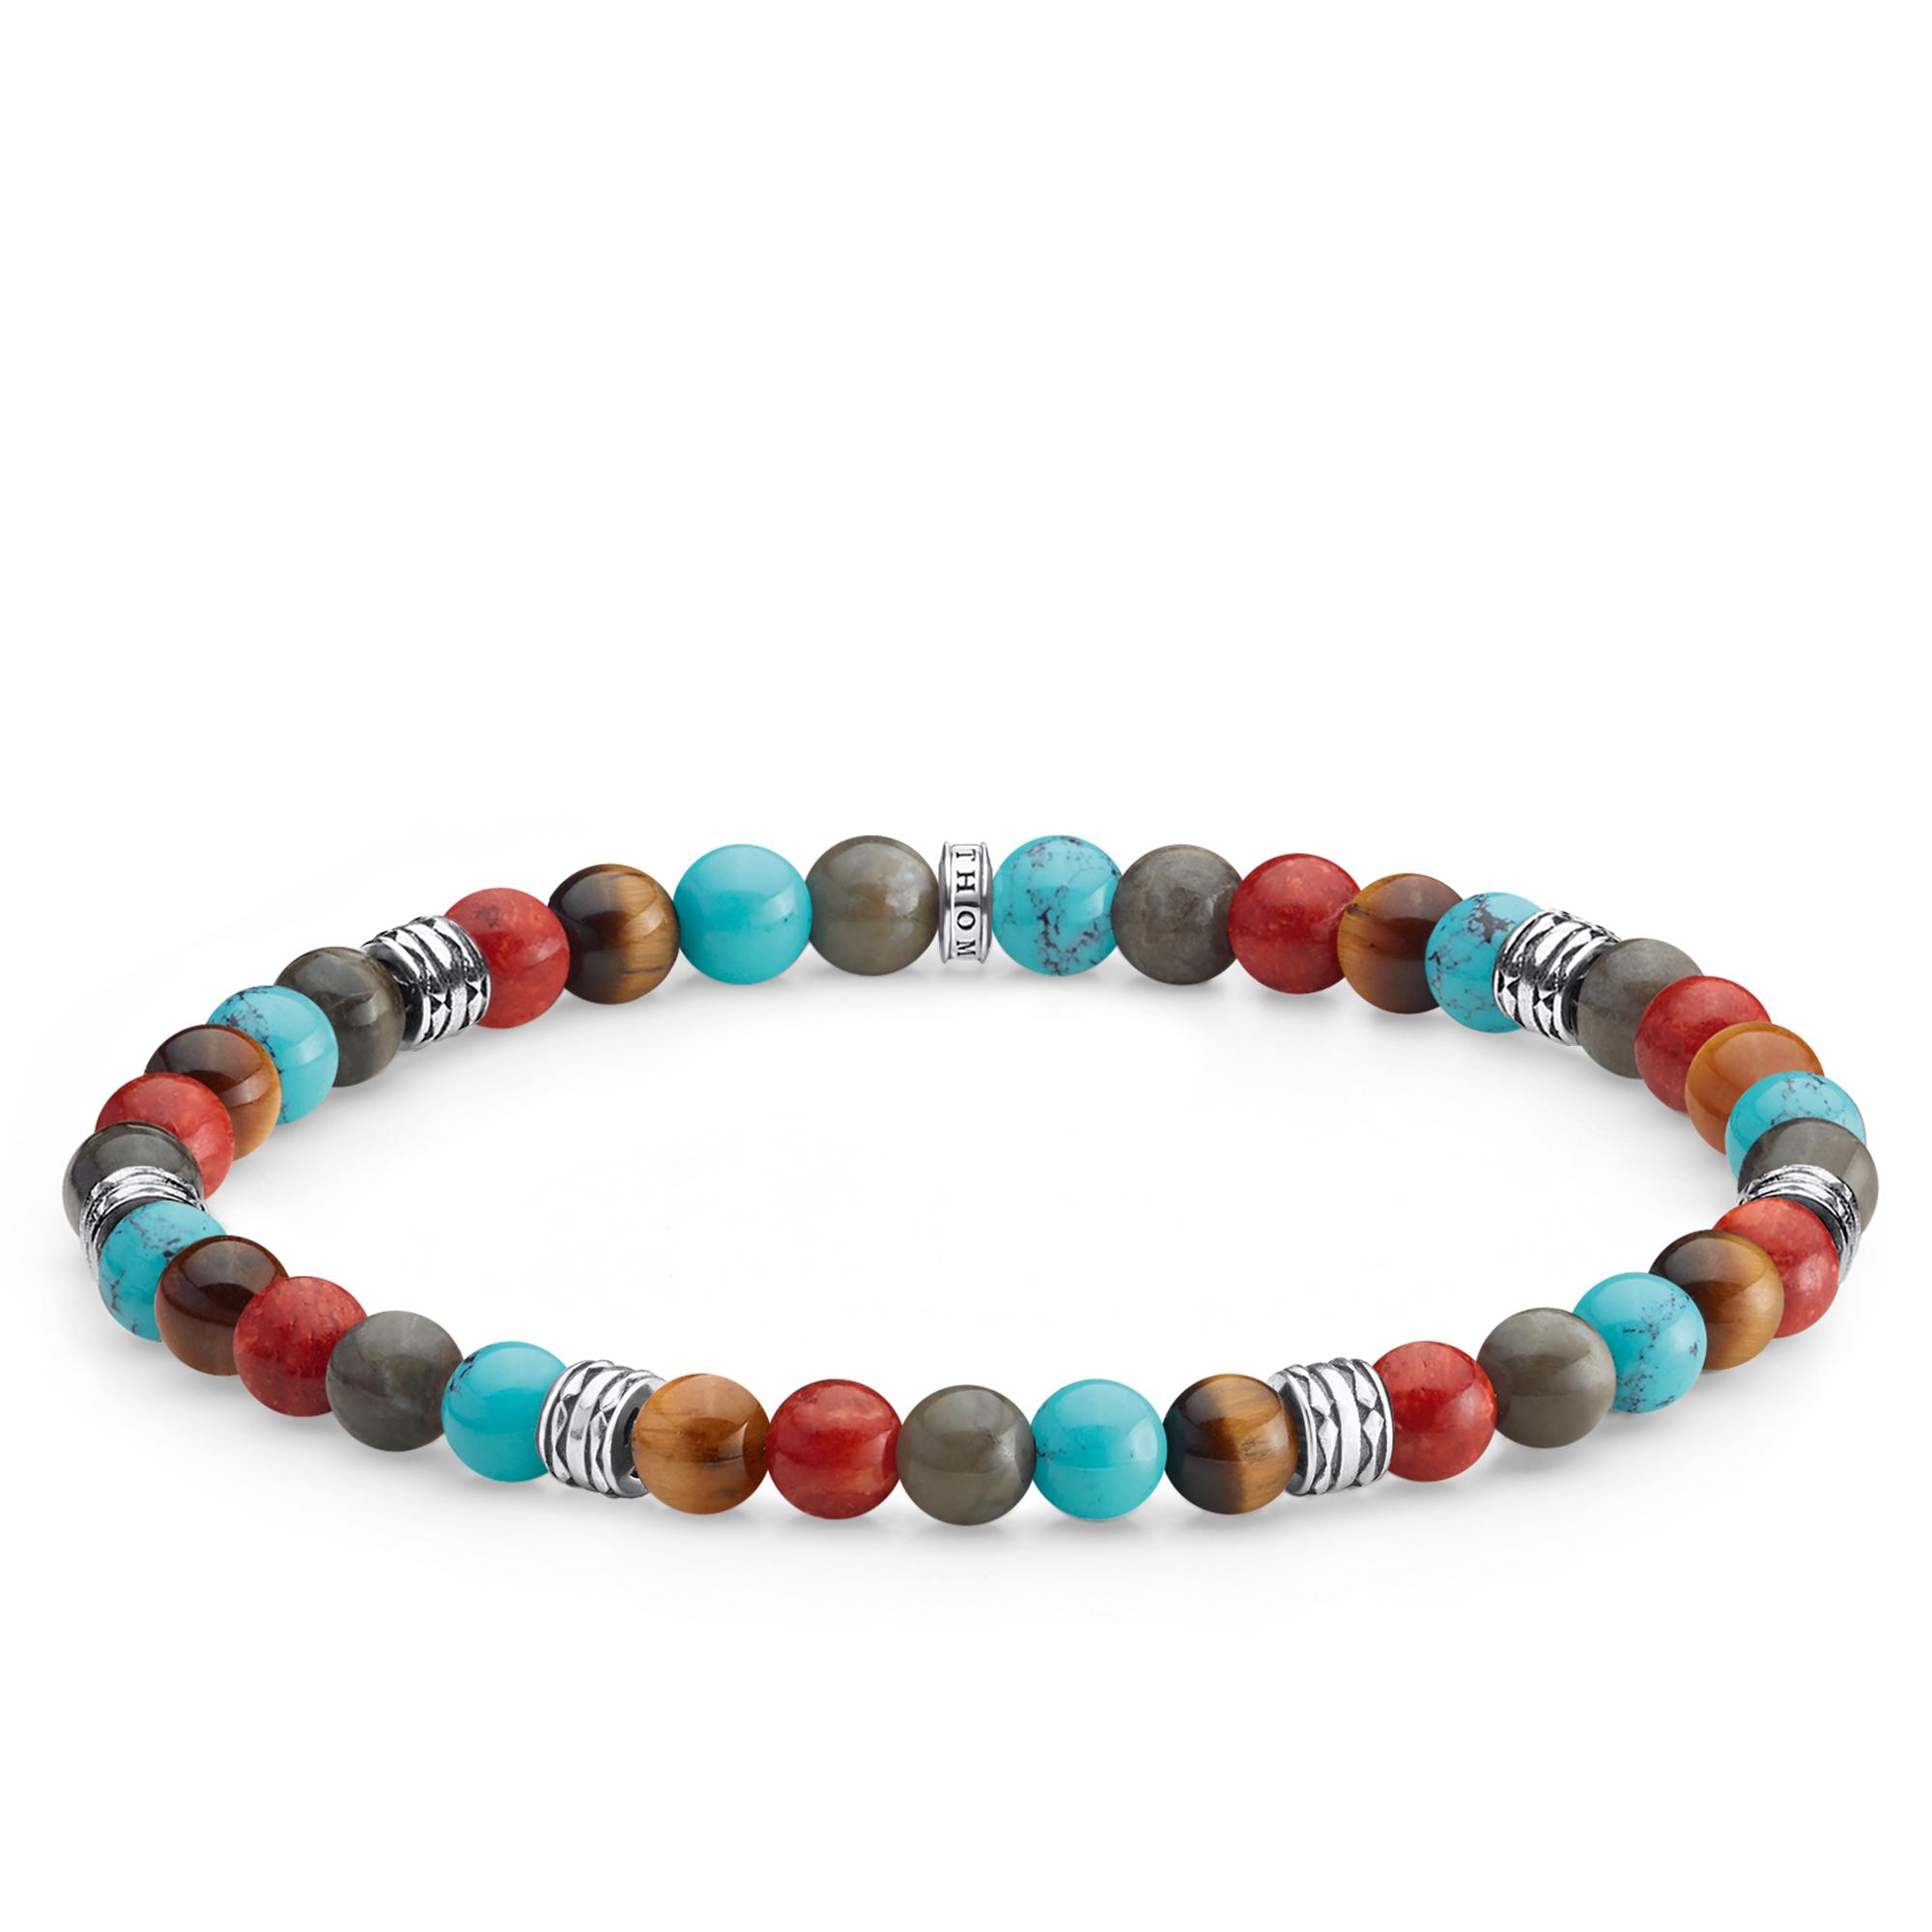 Bracelet Talisman multicolore, Thomas Sabo